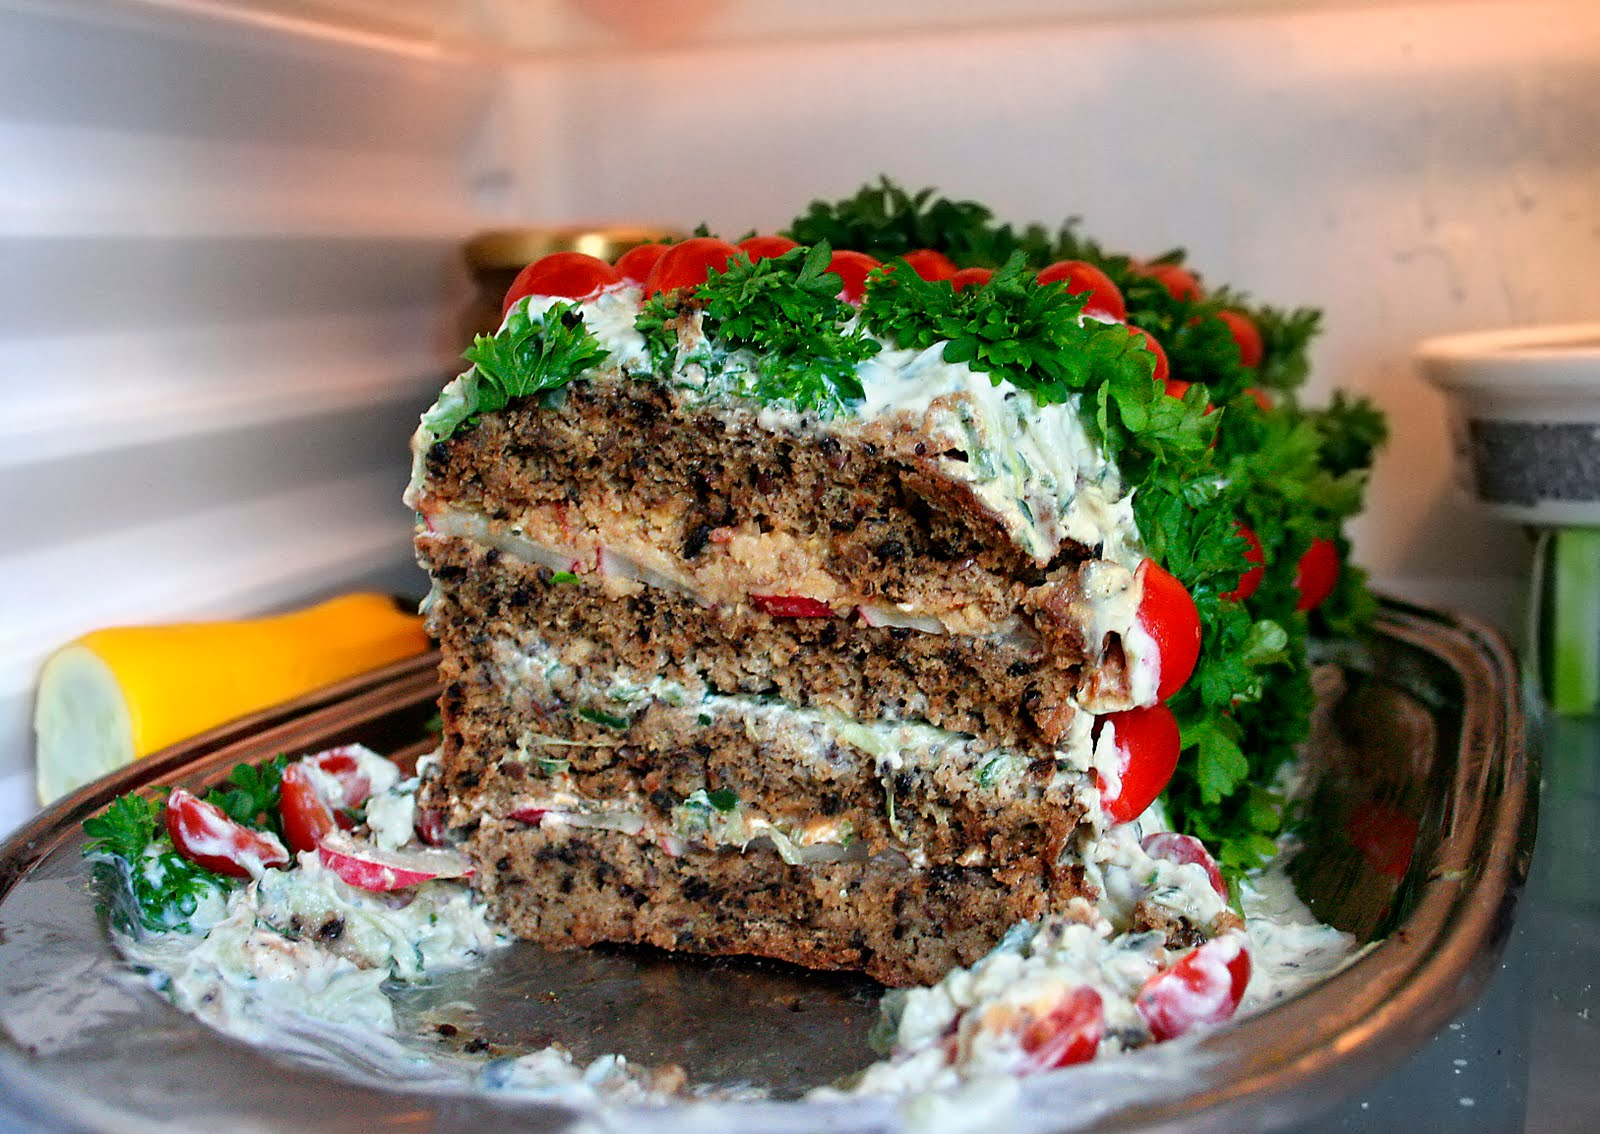 Sewish salty sandwich cake